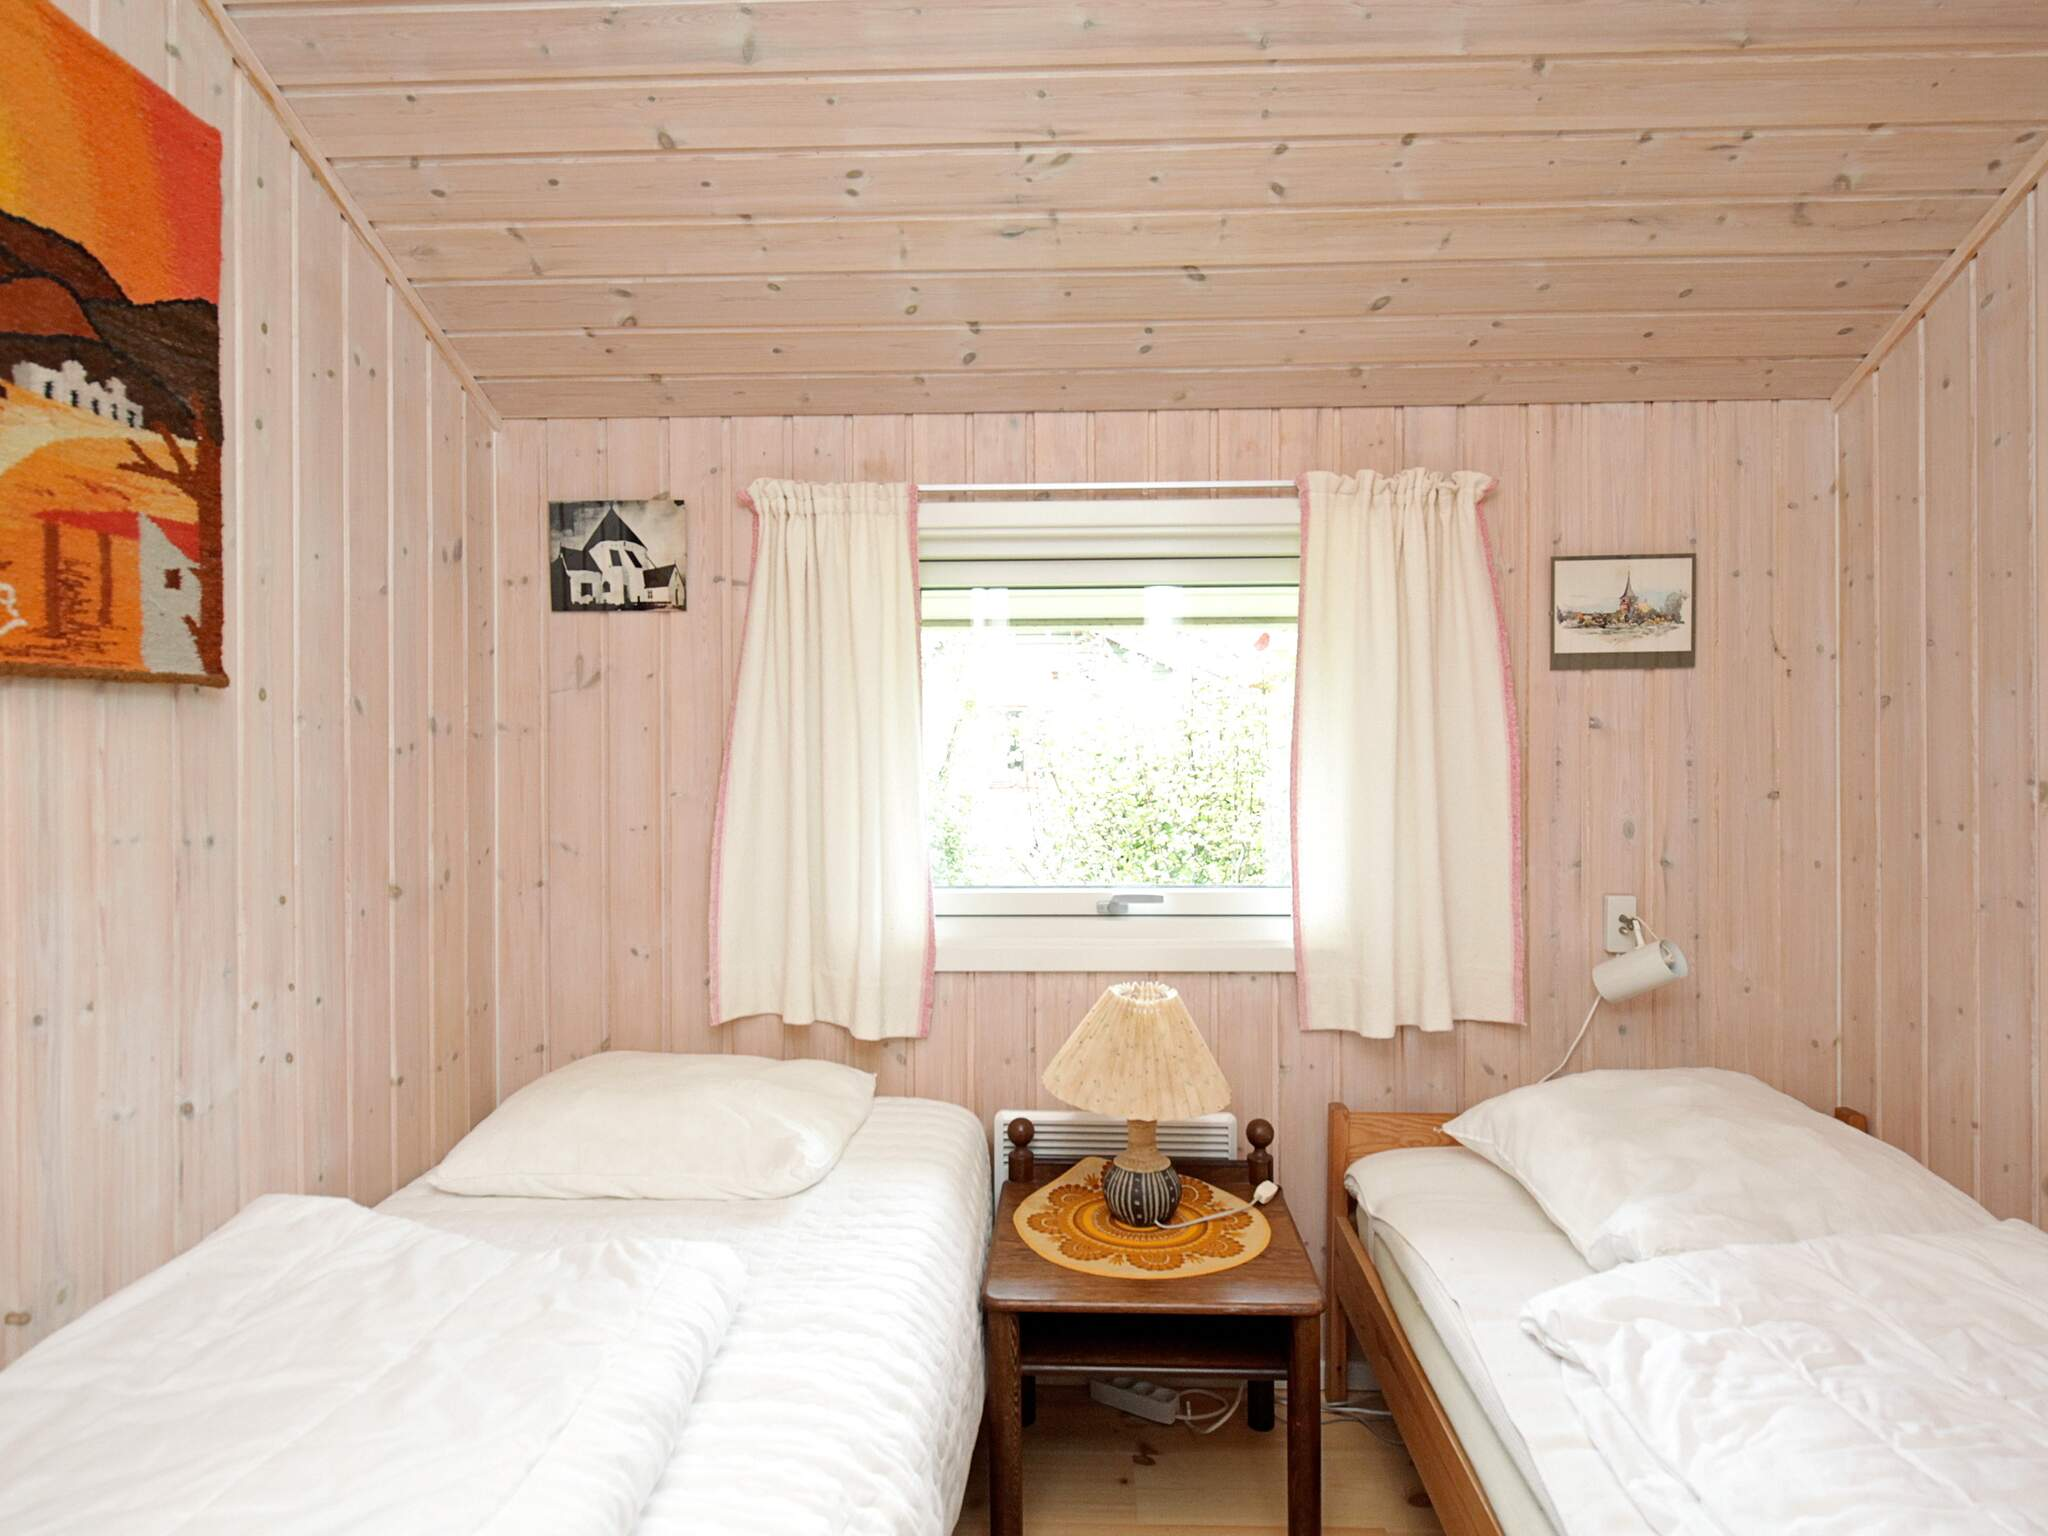 Ferienhaus Hyllingeriis (619896), Skibby, , Nordseeland, Dänemark, Bild 11